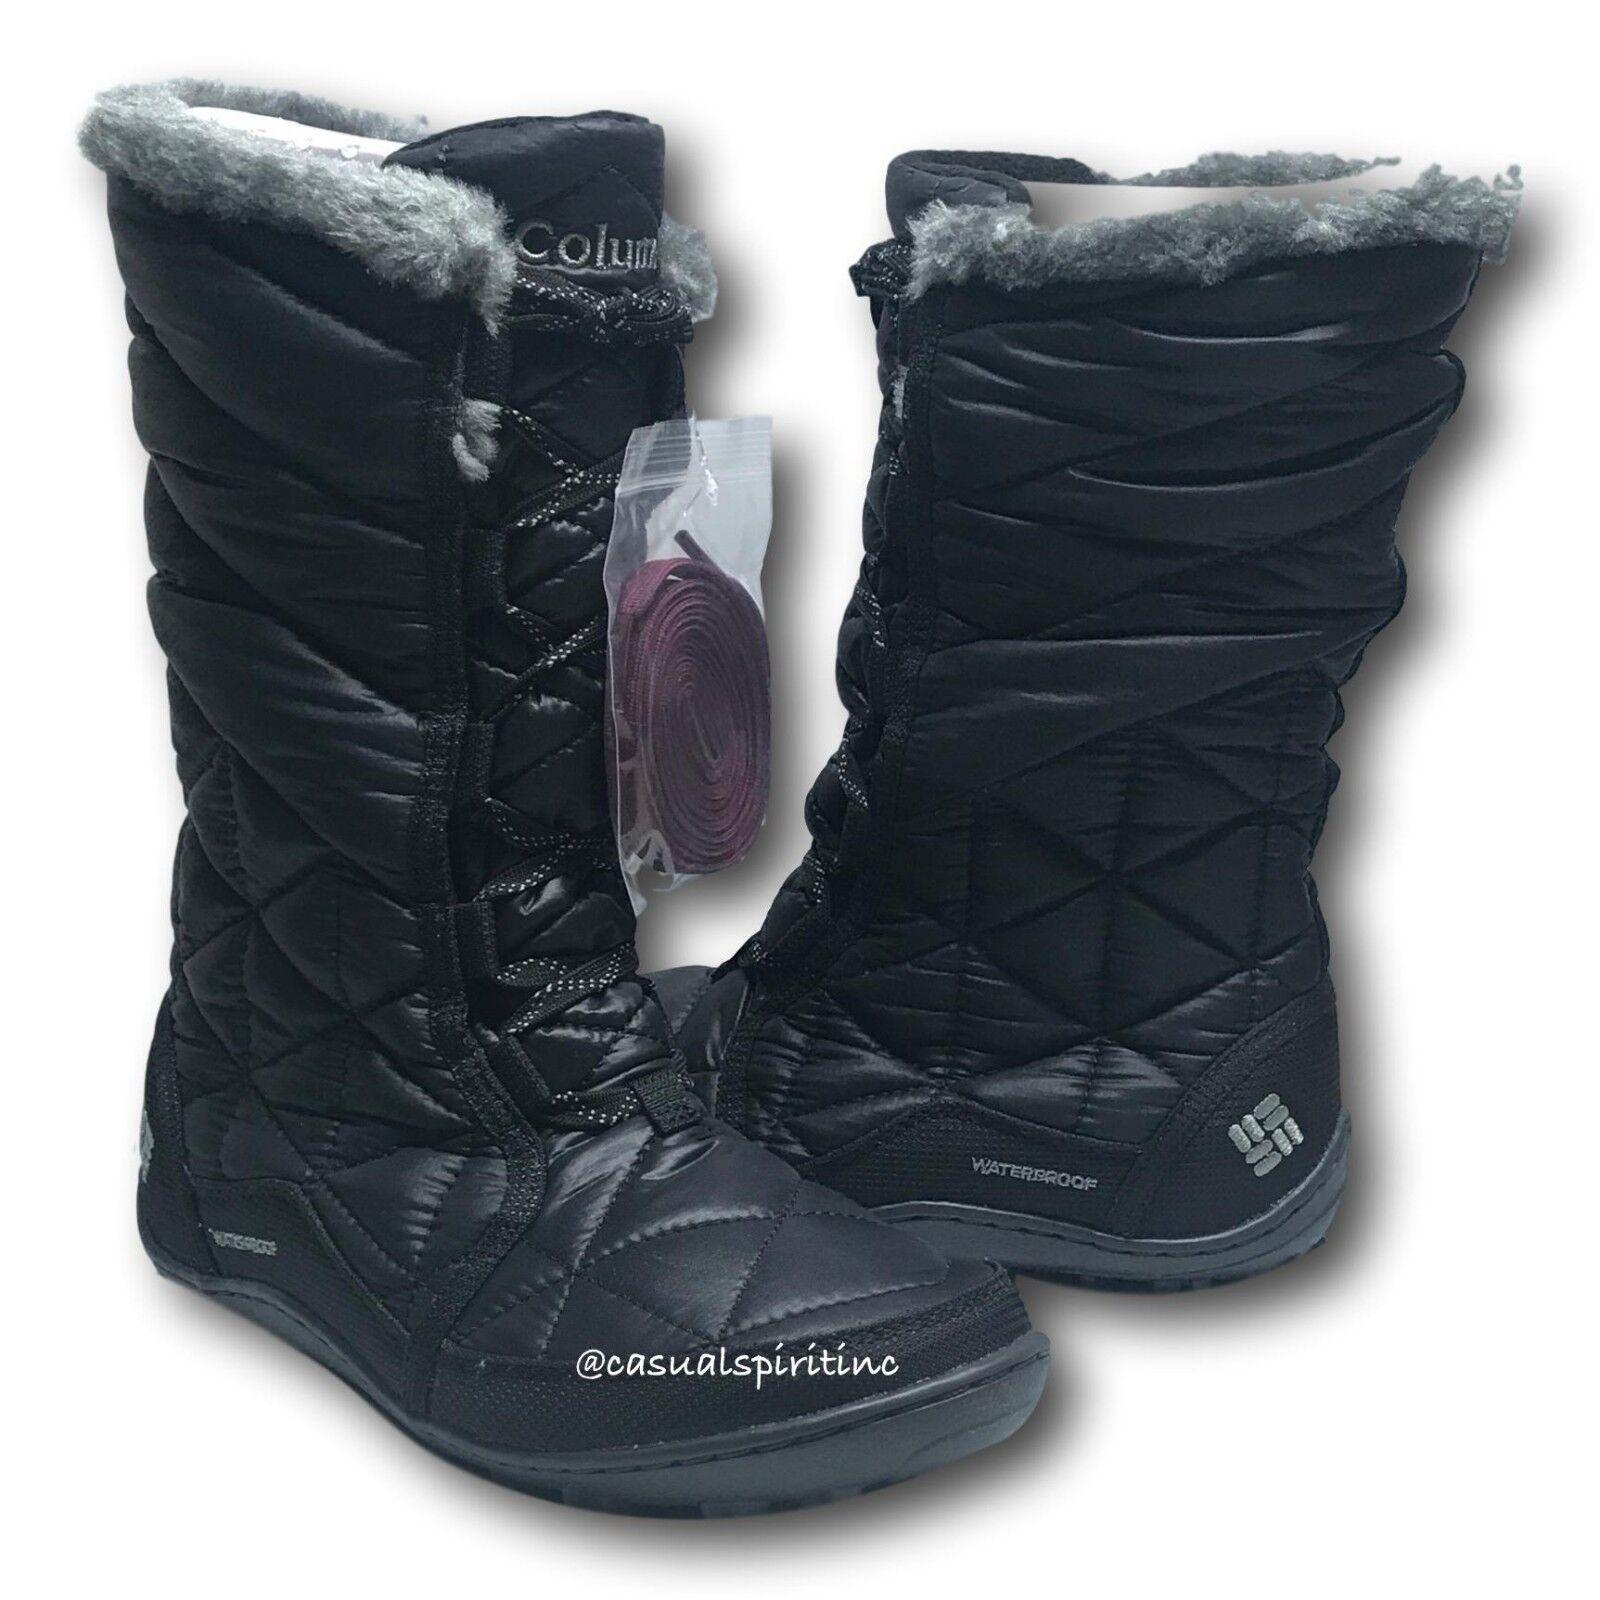 New  115 Columbia womens Powder Summit II waterproof winter snow boots Black